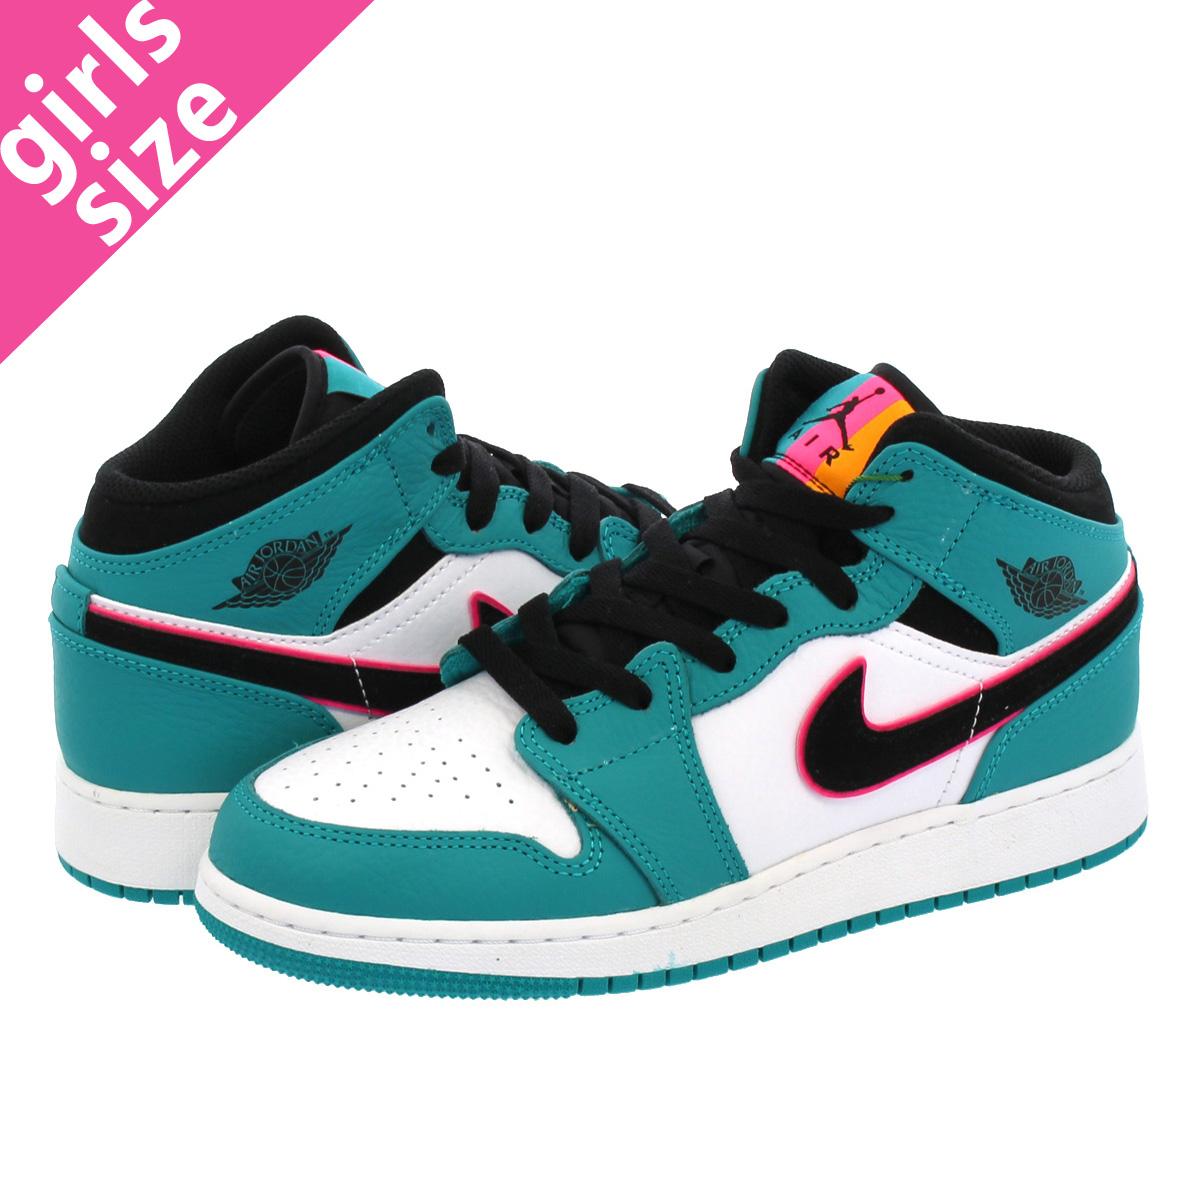 3aa2b5d89535 NIKE AIR JORDAN 1 MID BG Nike Air Jordan 1 mid BG TURBO GREEN BLACK HYPER  PINK ORANGE PEEL bq6931-306